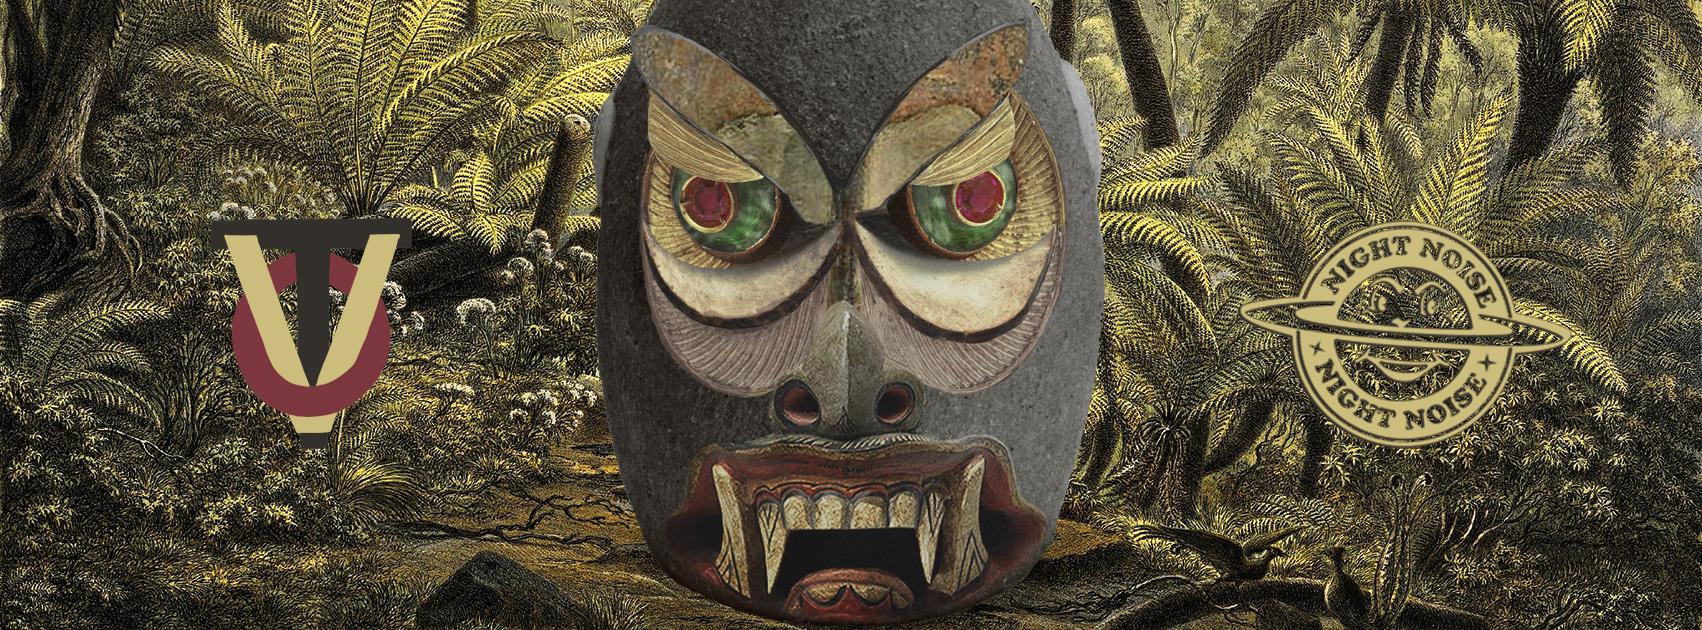 Tales Of Voodoo – Moon Rituals (Night Noise)